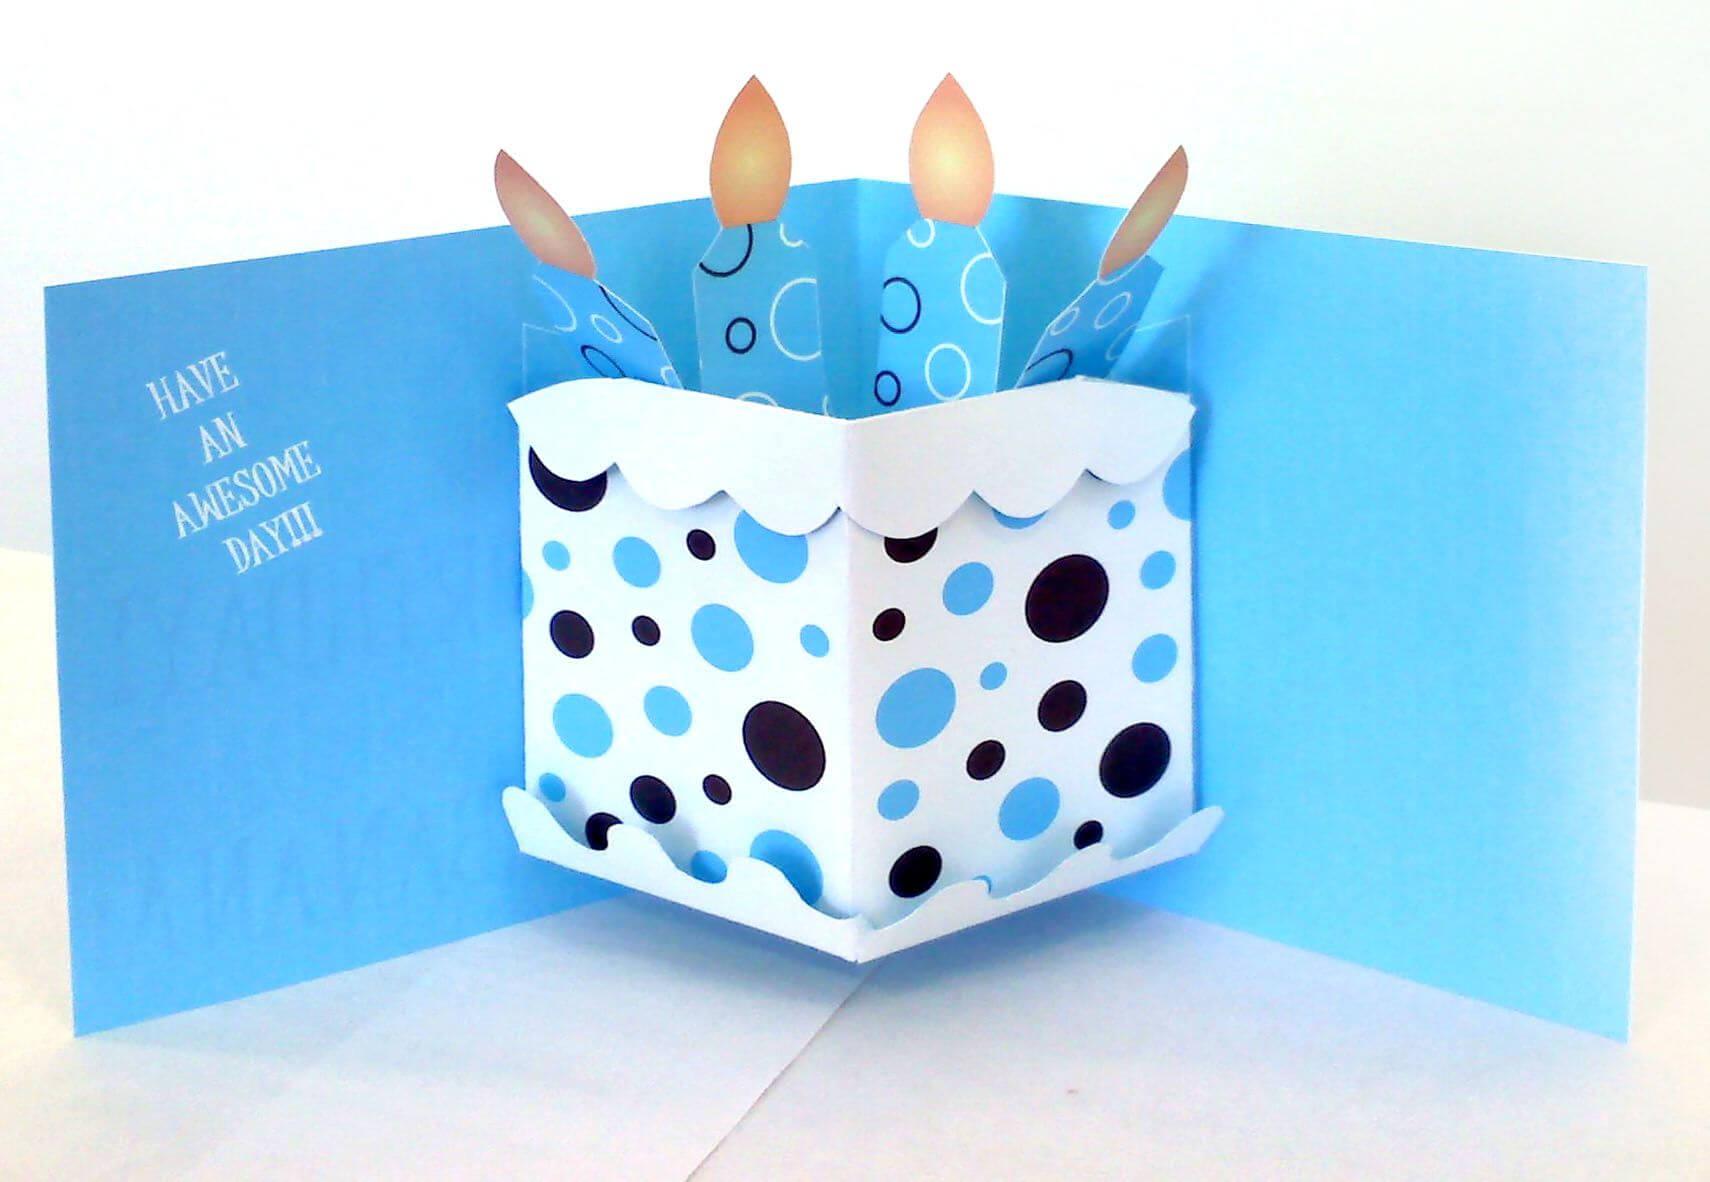 Pop Up Birthday Card | Pop Up Card Templates, Birthday Card intended for Pop Up Card Templates Free Printable